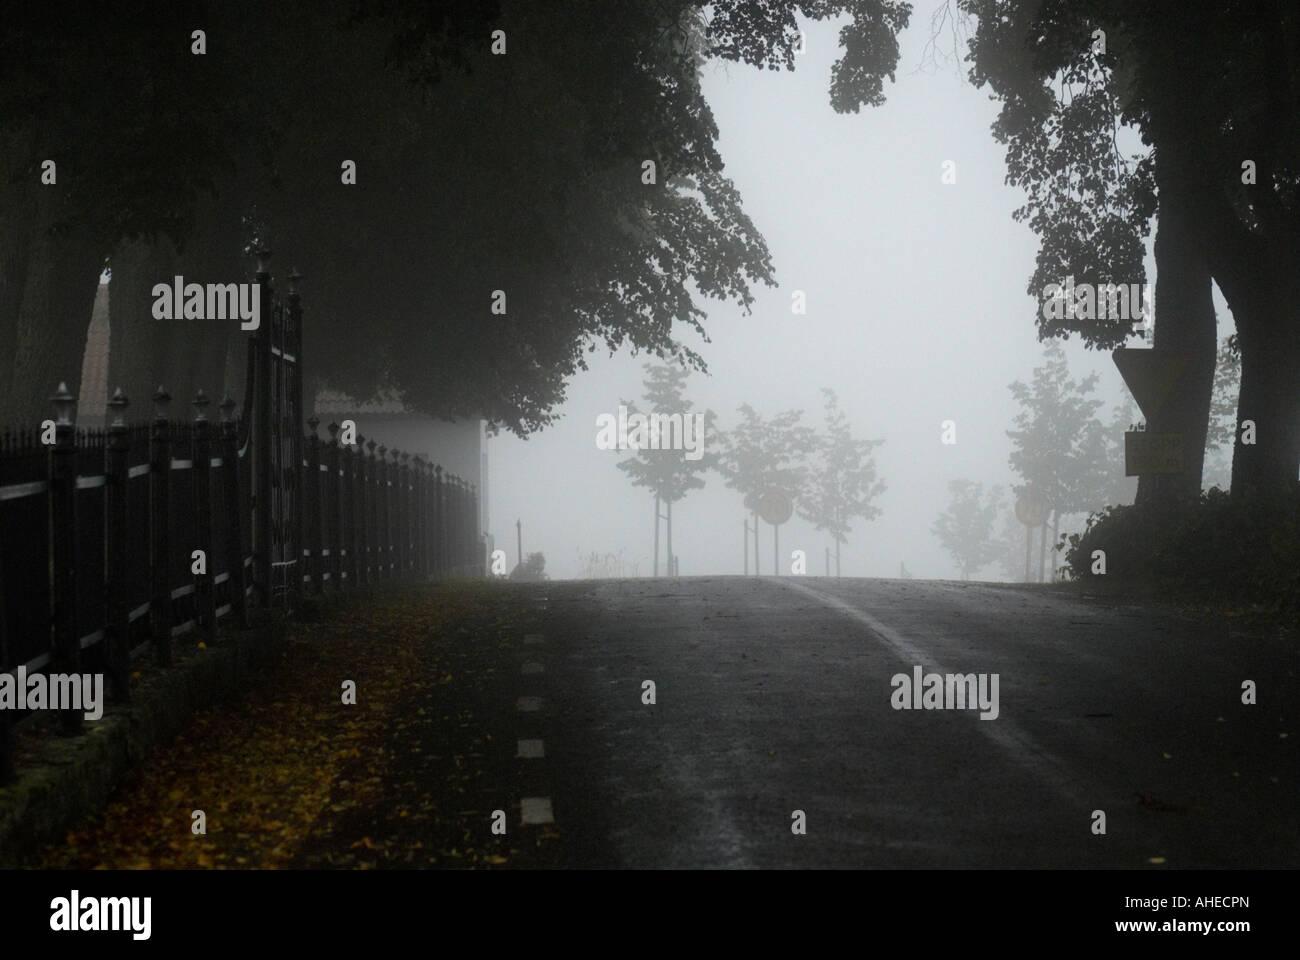 Misty road Stock Photo